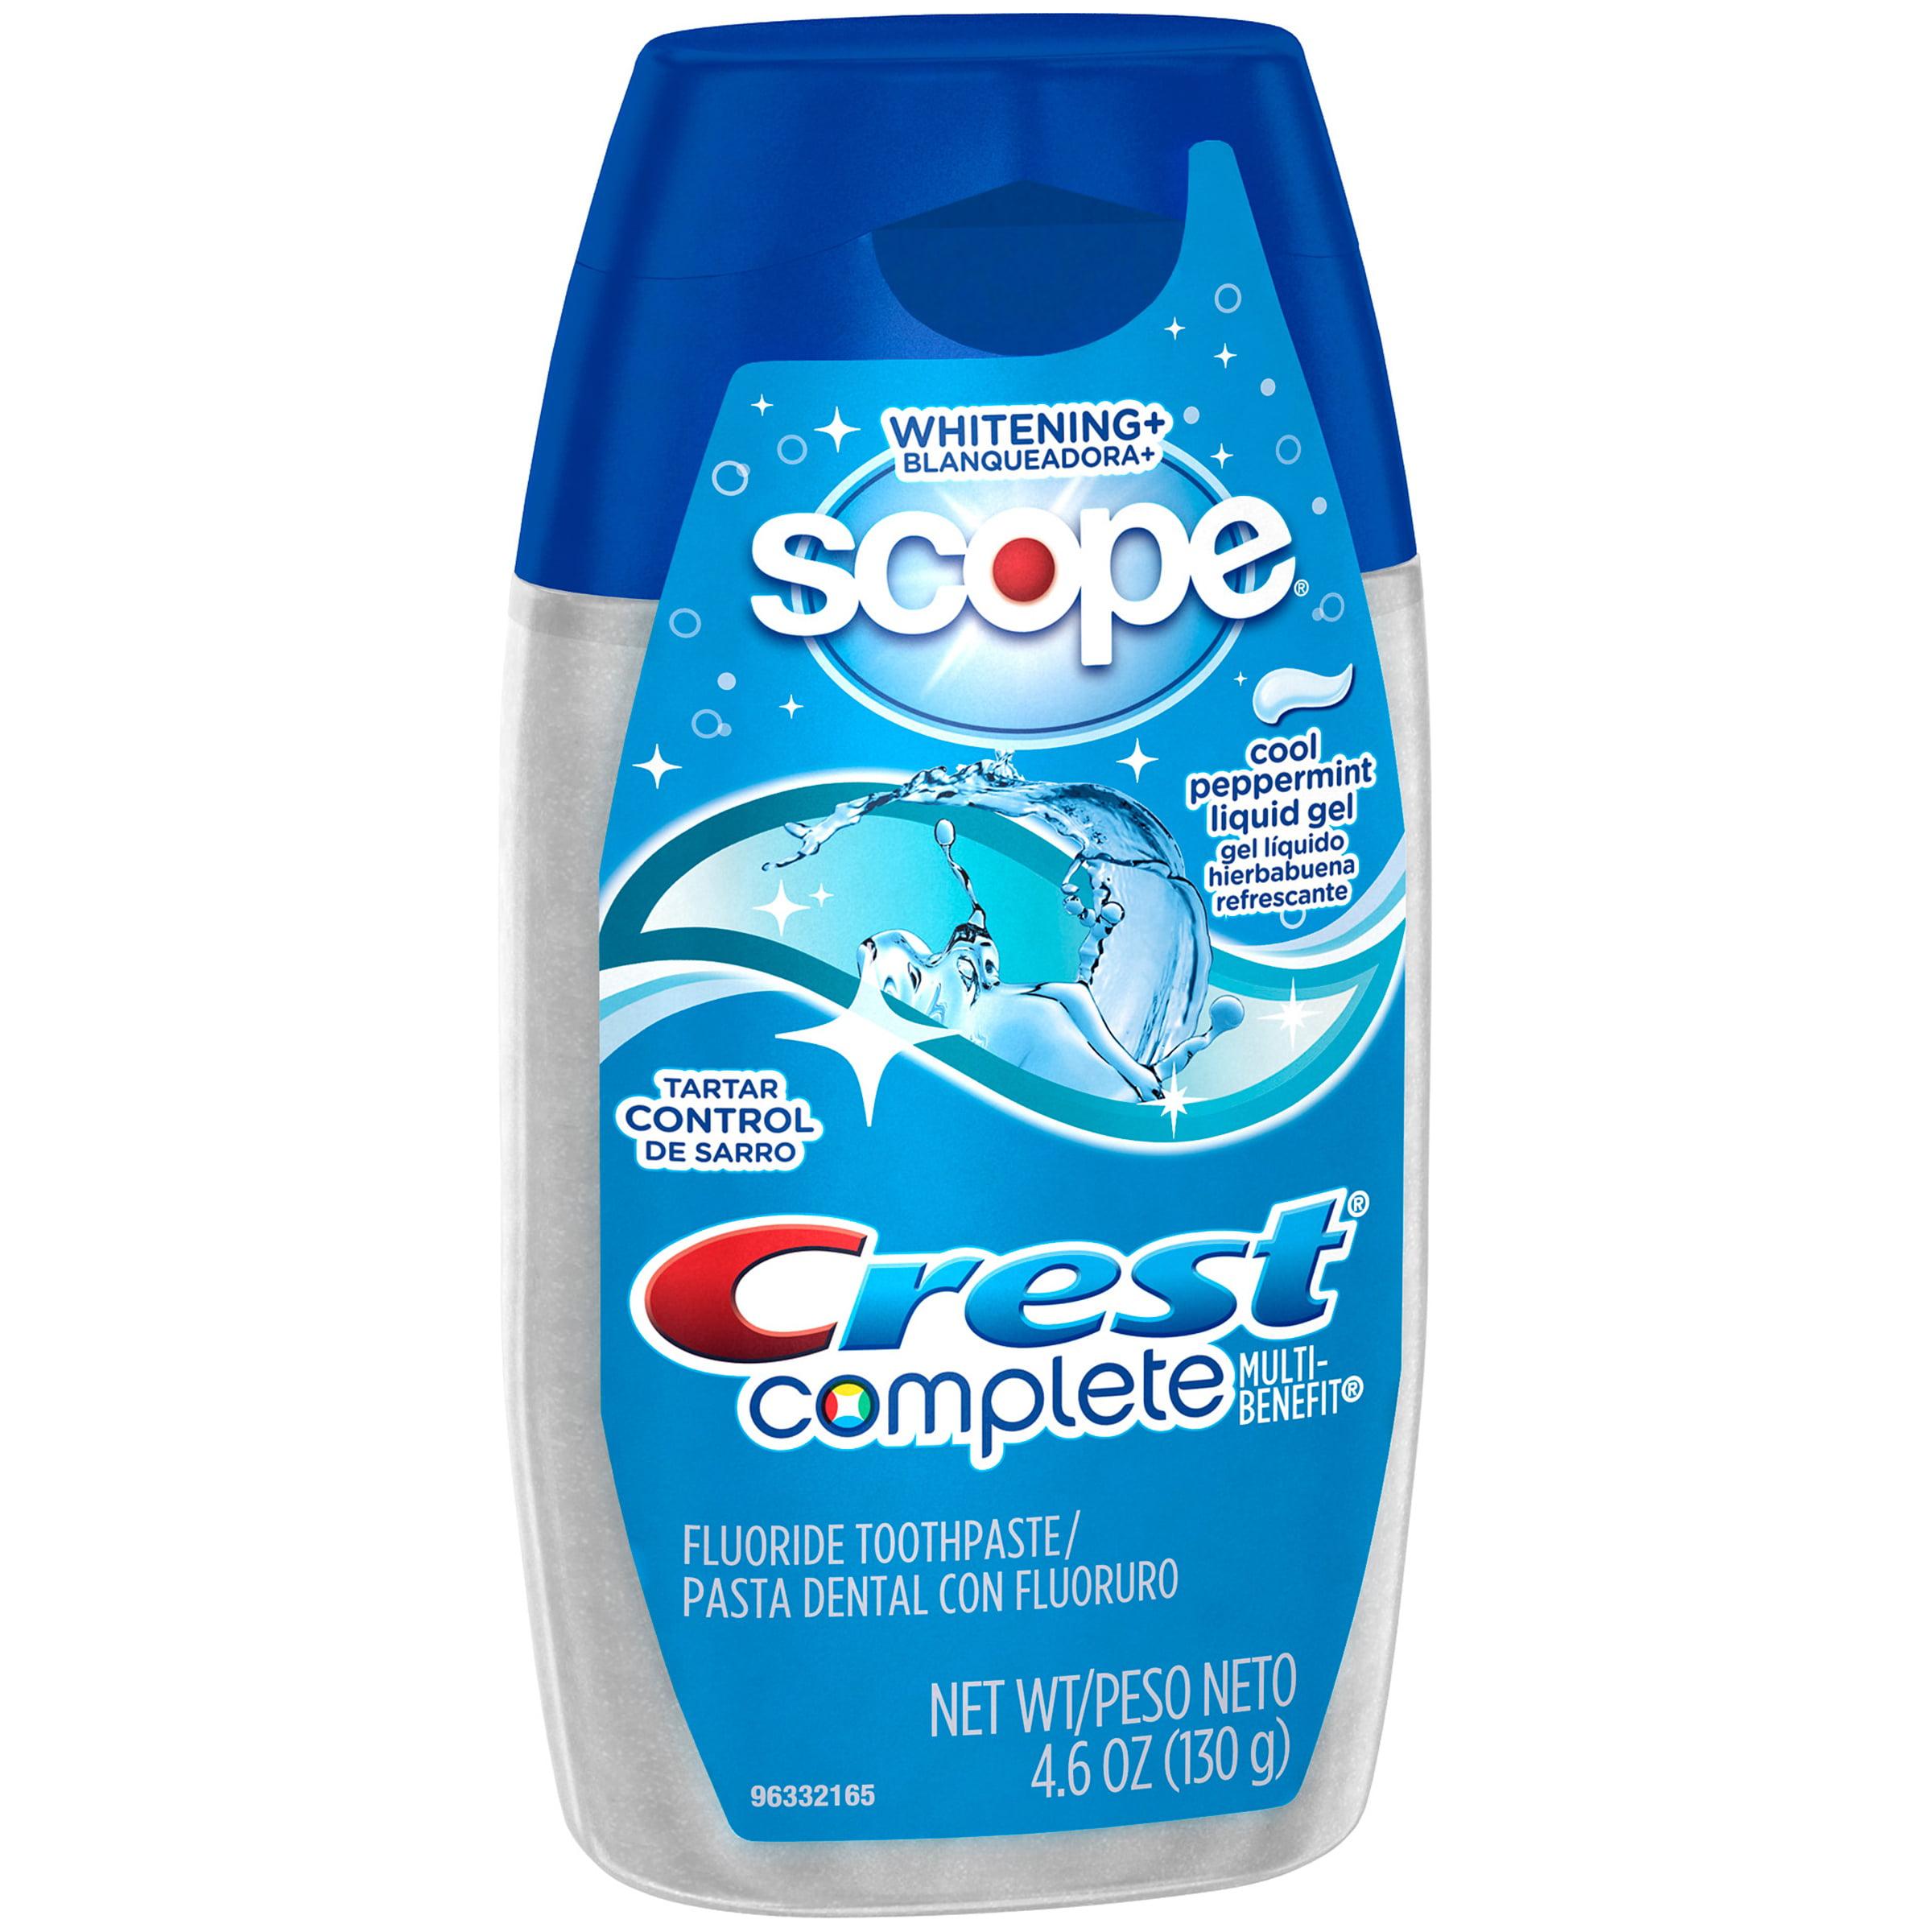 Crest Complete Multi-Benefit Whitening + Scope Cool Peppermint Flavor Liquid Gel Toothpaste 4.6 Oz